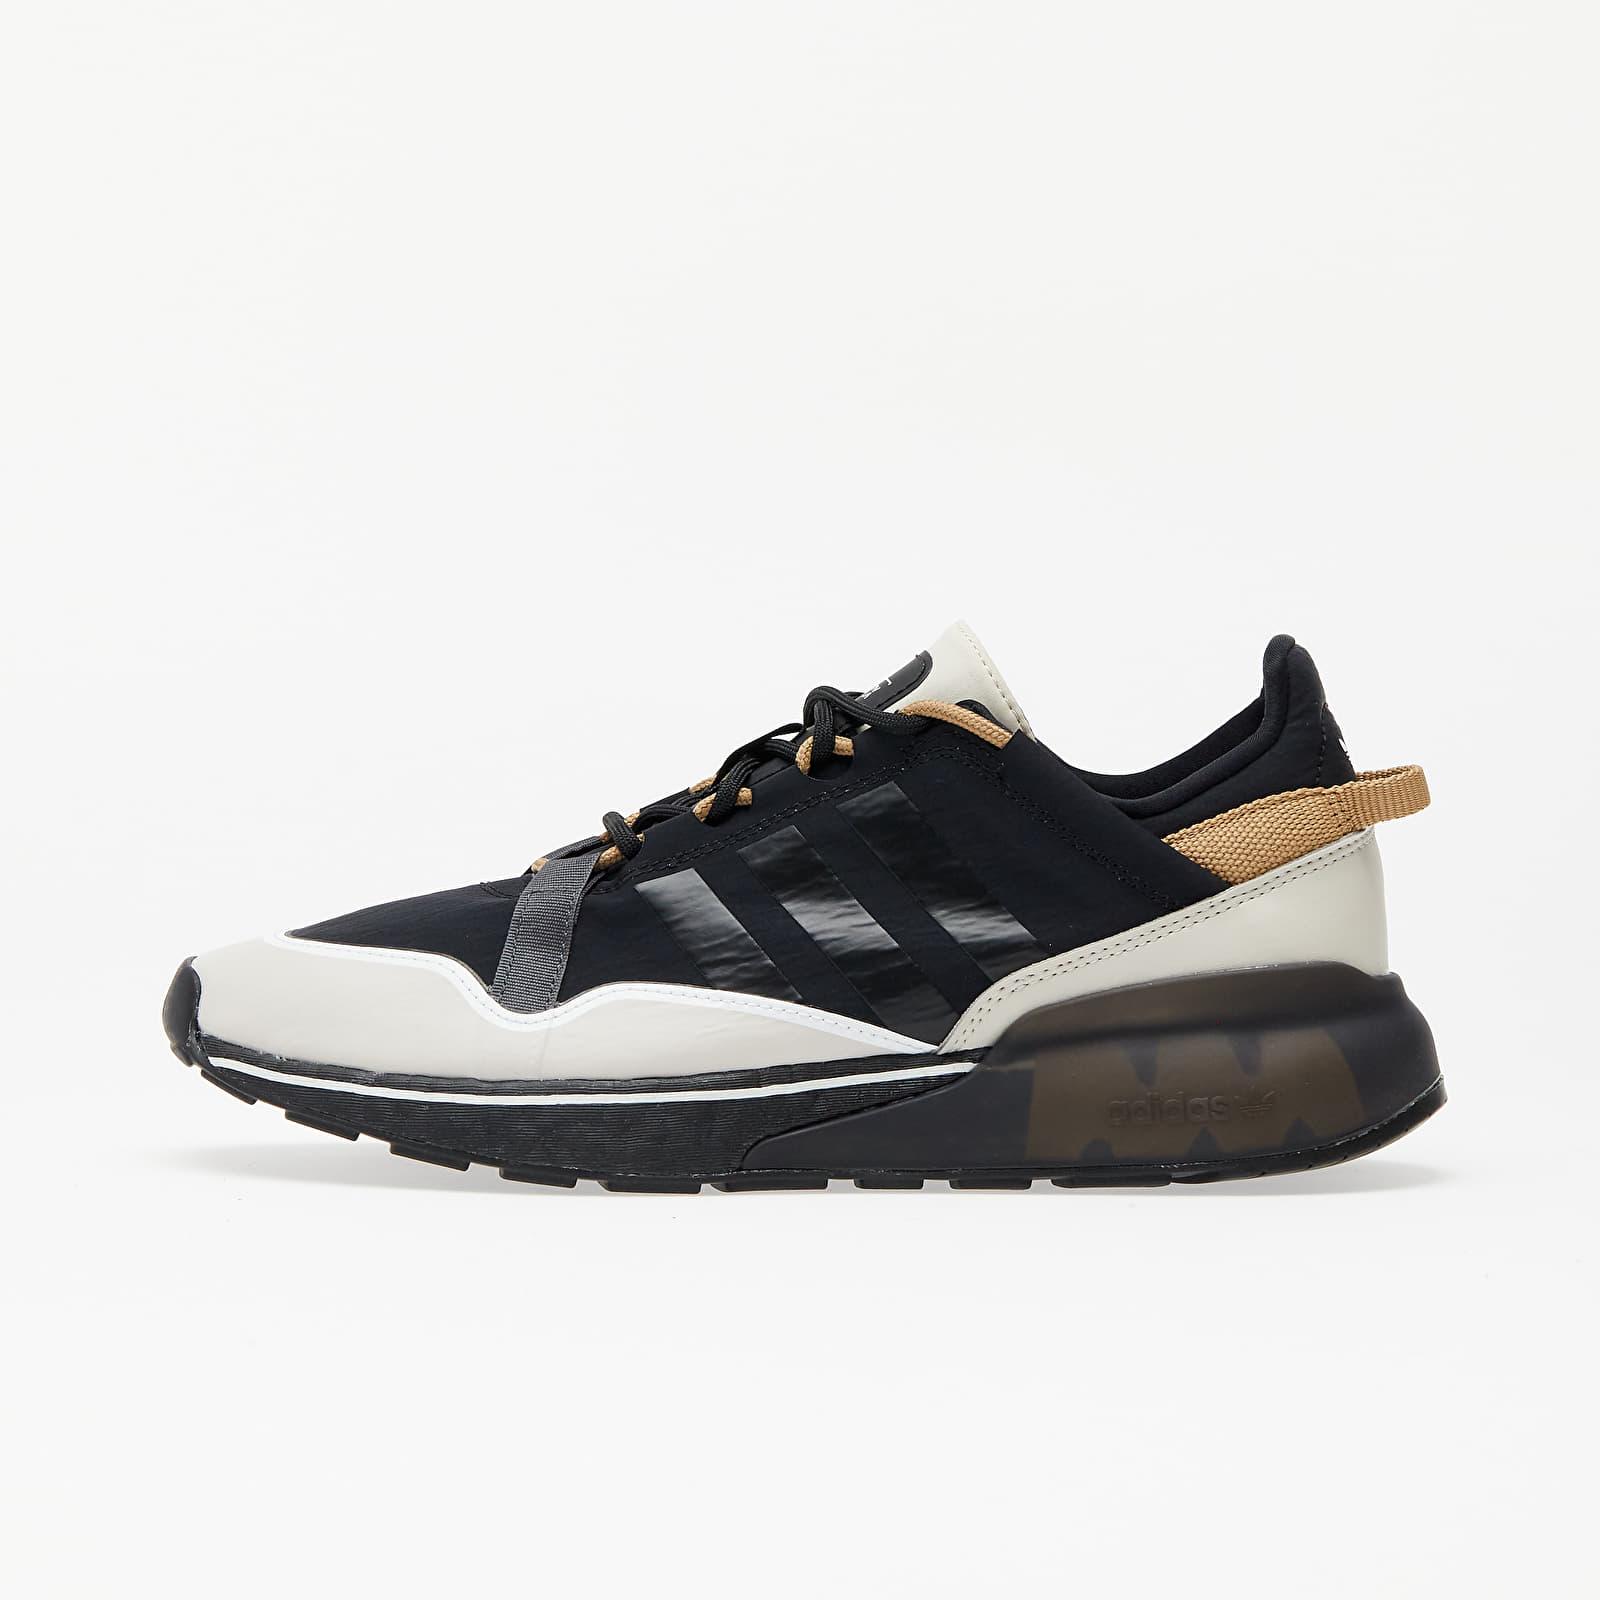 Мужская обувь adidas ZX 2K BOOST Pure Core Black/ Clear Brown/ Cardboard